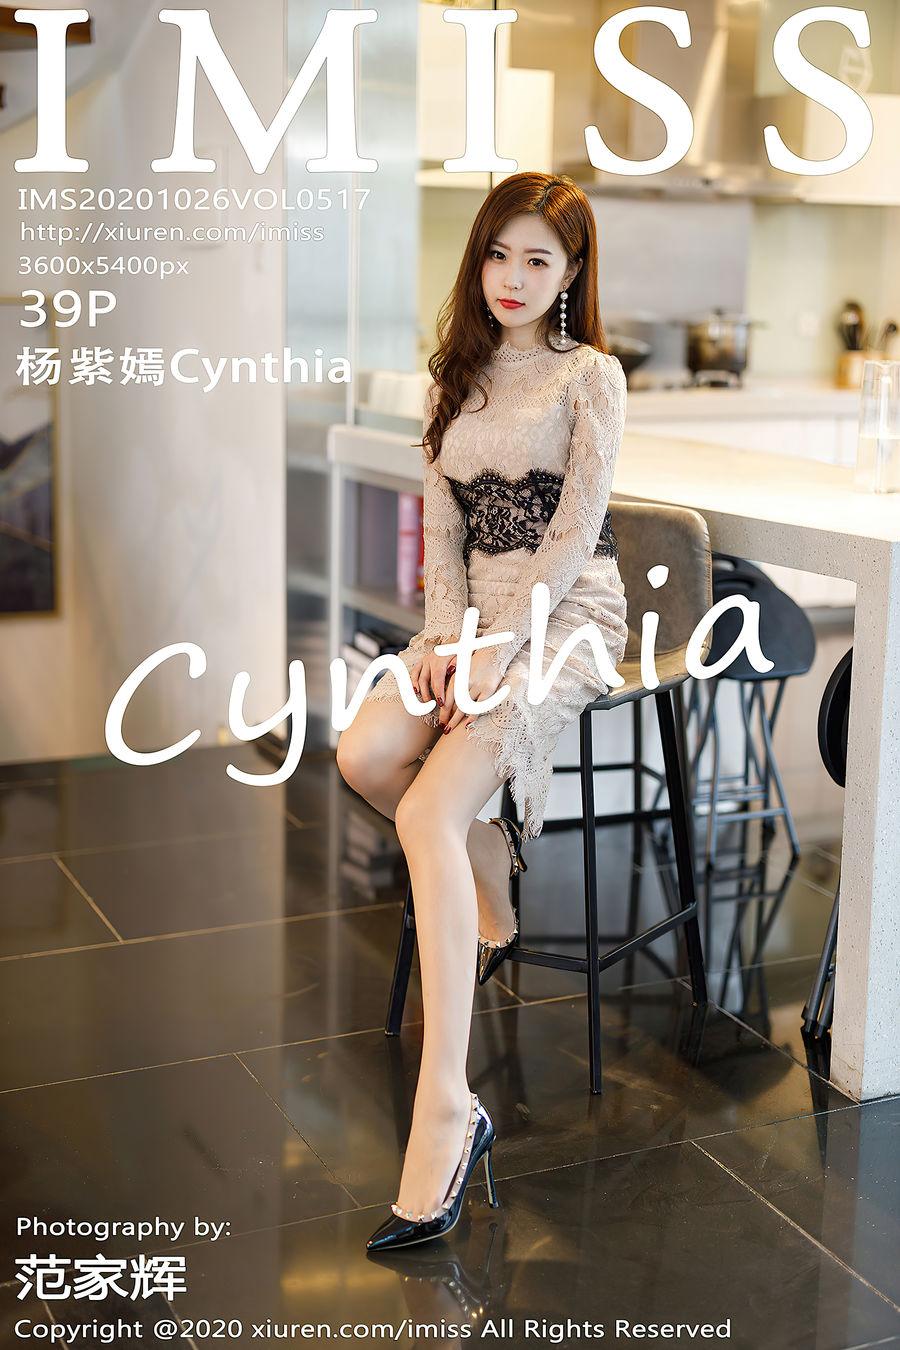 [IMISS爱蜜社] VOL.517 杨紫嫣Cynthia [39+1P/391M]